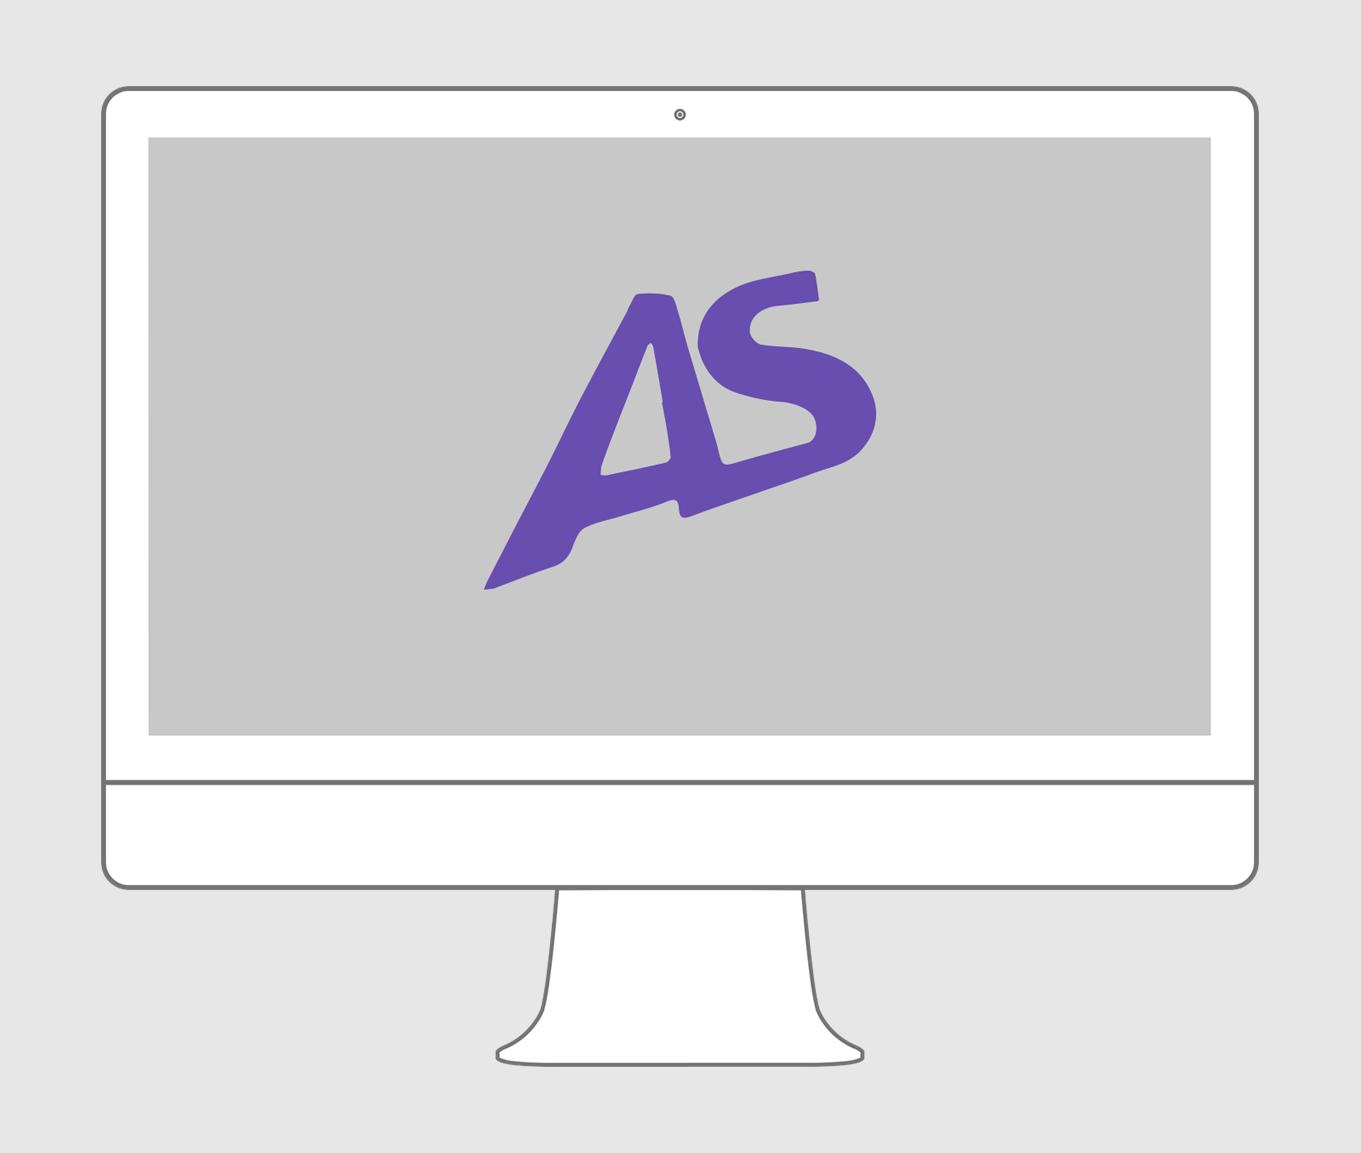 Pocetak rada sajta Asalto.rs - Aluminijumska i PVC Stolarija